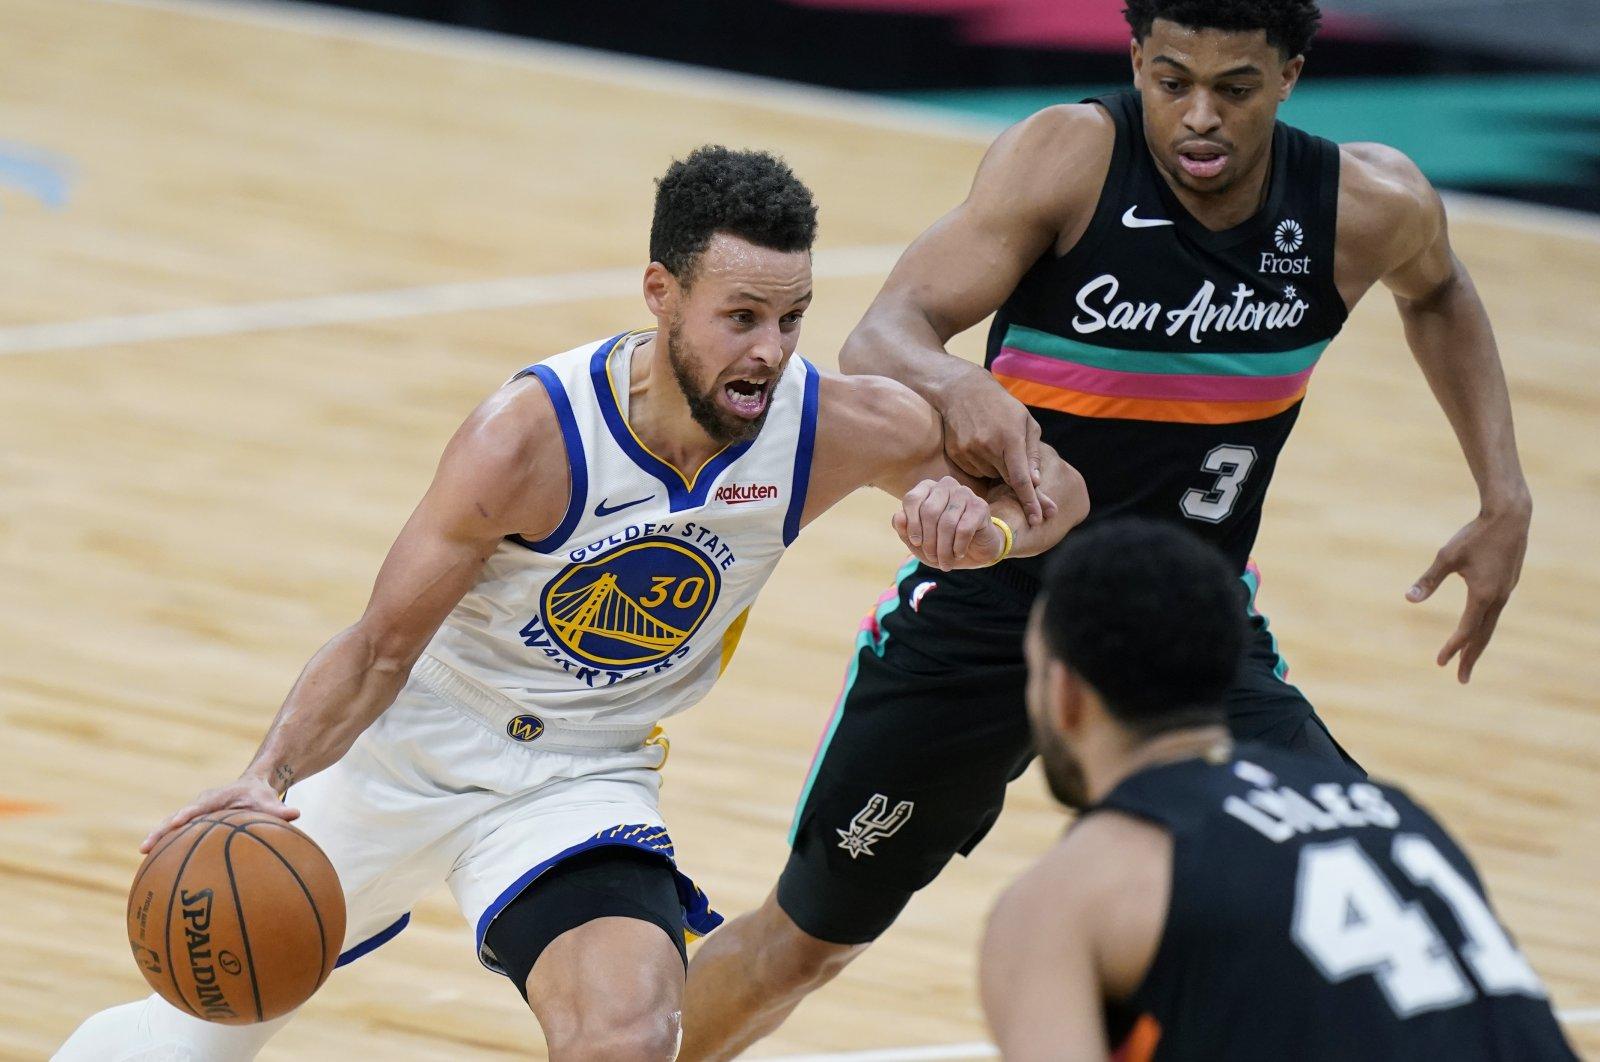 Golden State Warriors guard Stephen Curry (L) drives past San Antonio Spurs forward Keldon Johnson (R) during an NBA game in San Antonio, Tuesday, Feb. 9, 2021. (AP Photo)